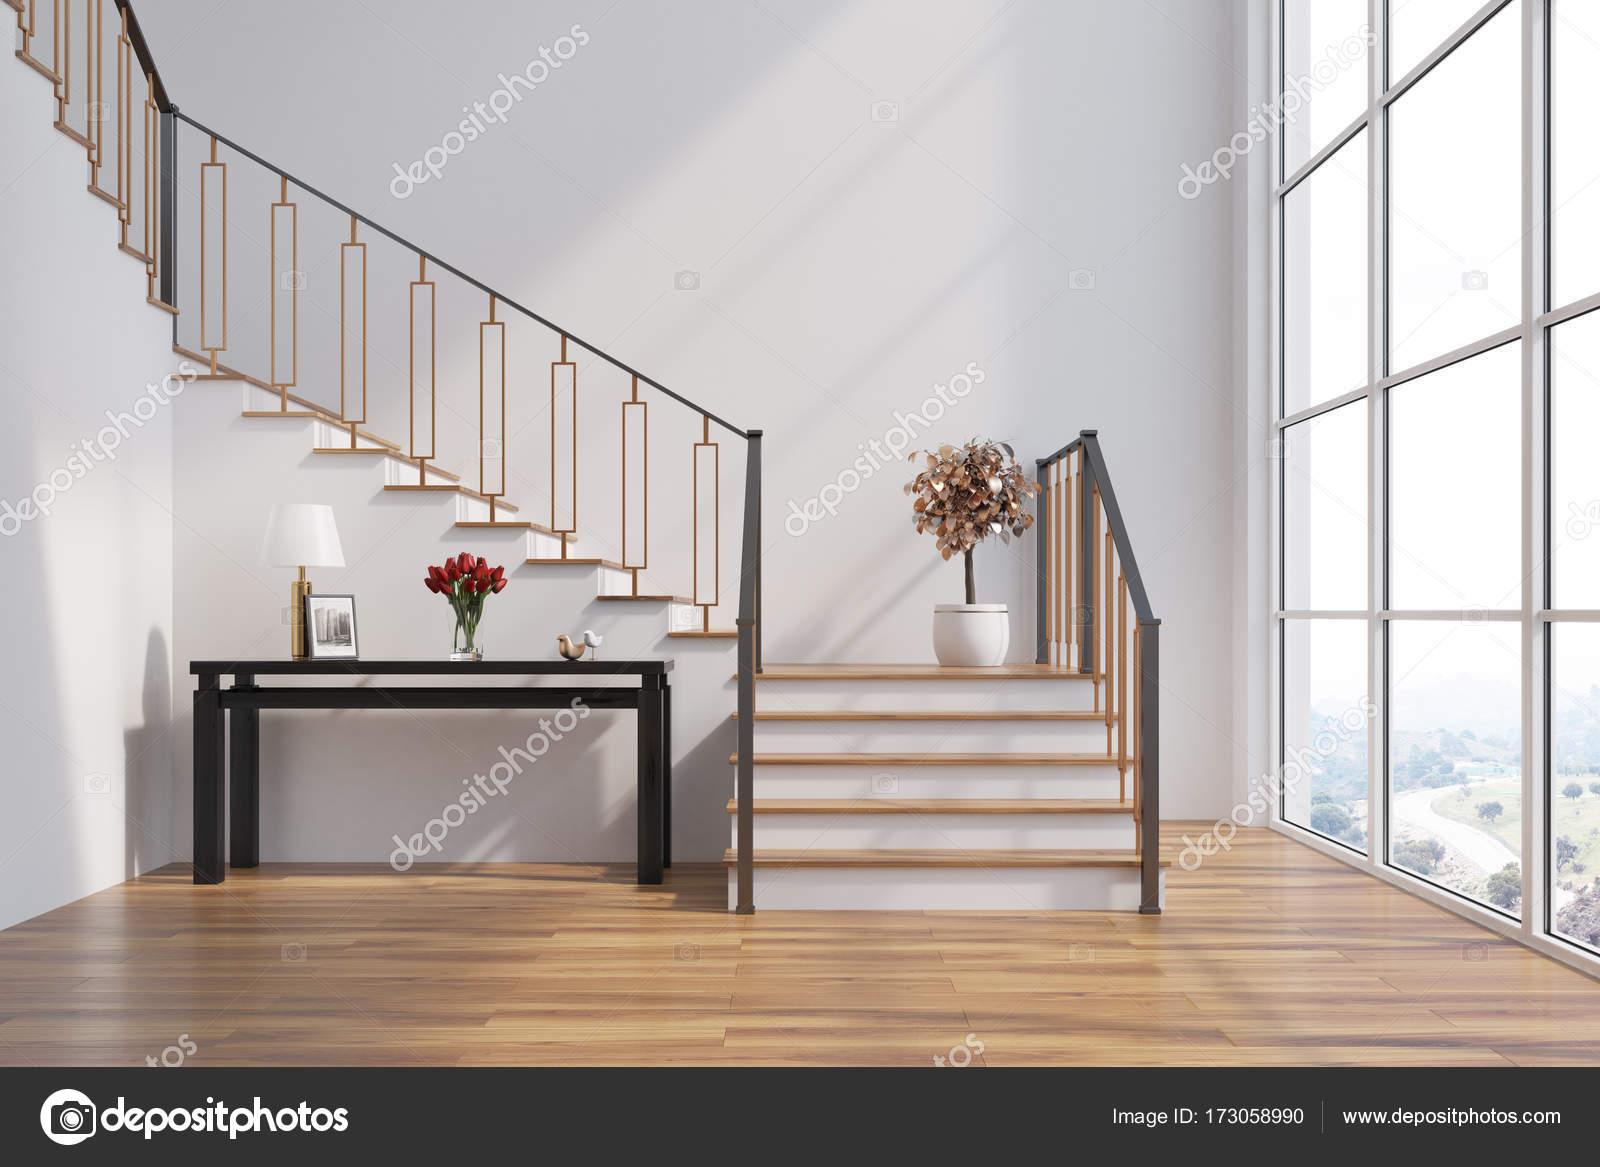 Wit woonkamer trap tabel u stockfoto denisismagilov